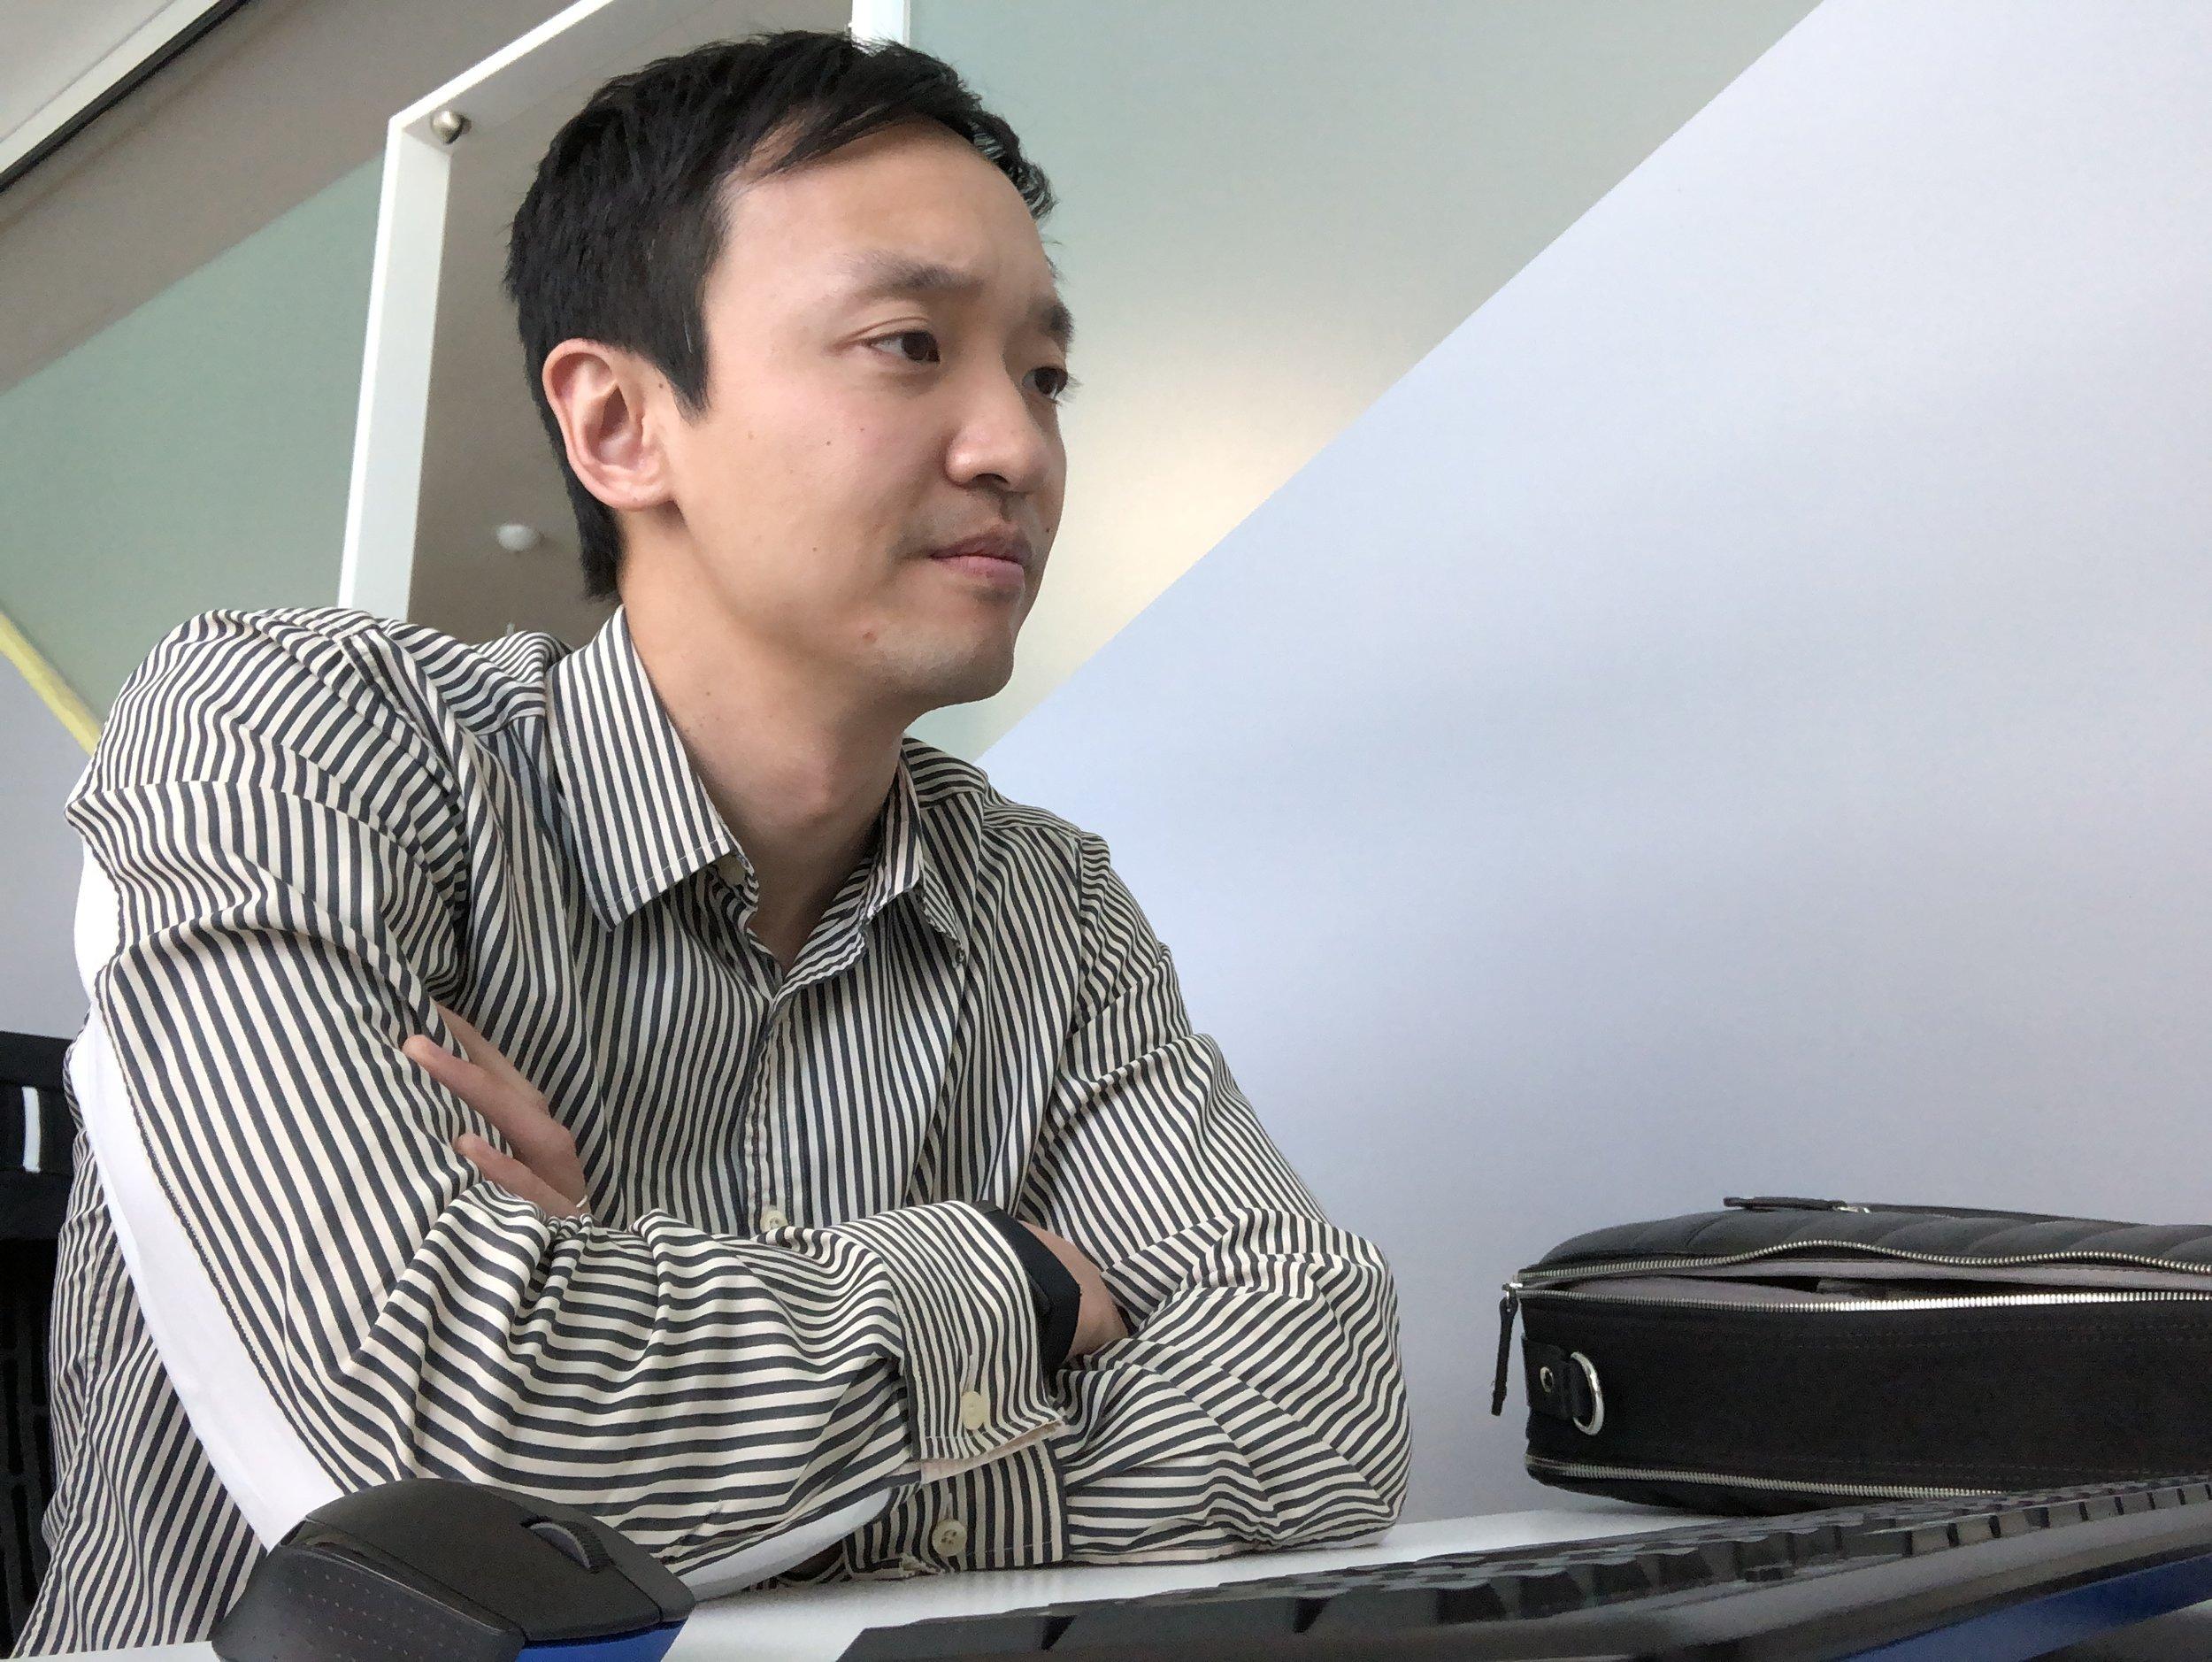 John Kim, pictured, video editing at his desk (image courtesy of John Kim)